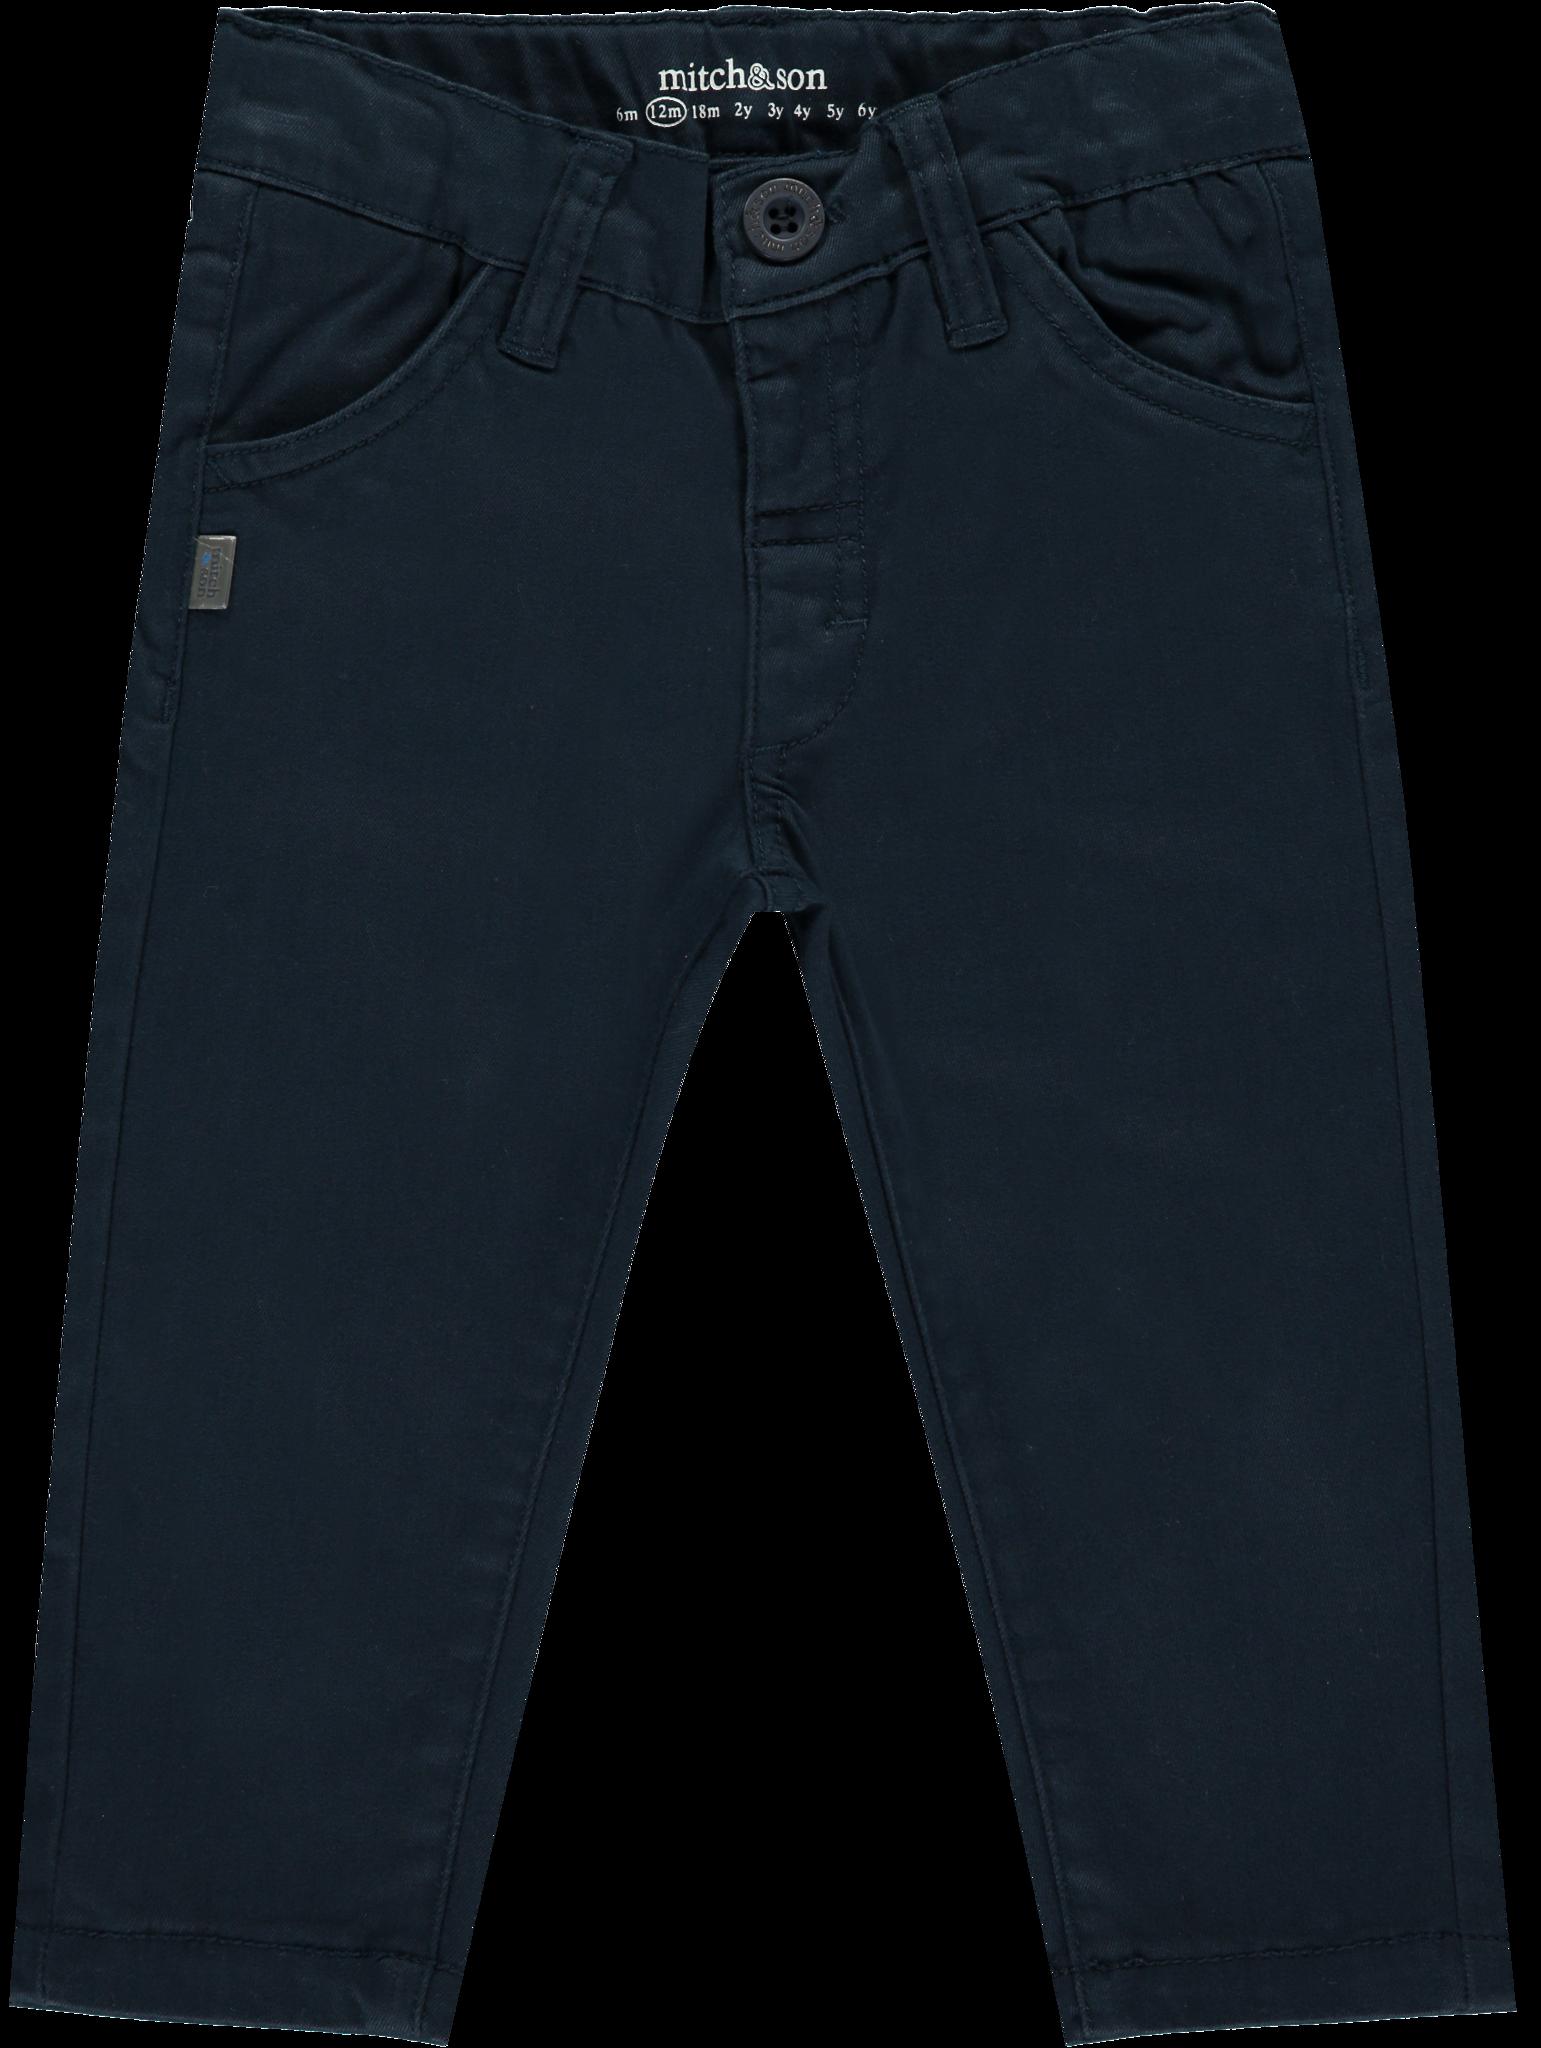 Mitch and Son Mitch & Son Samuels MS1229 Navy Twill Trouser